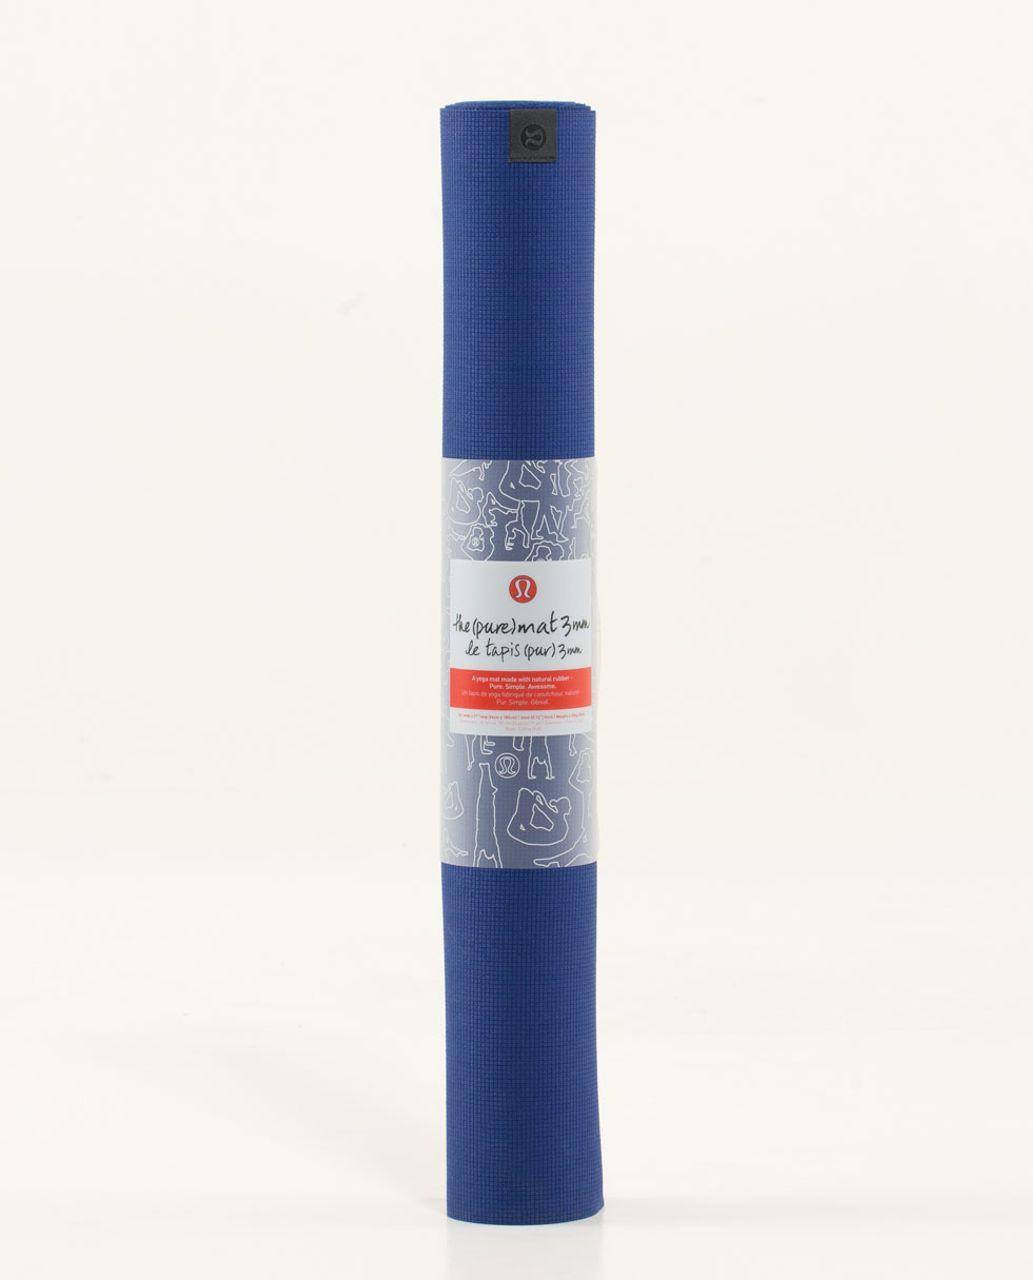 Lululemon The Pure Mat 3mm - Pigment Blue